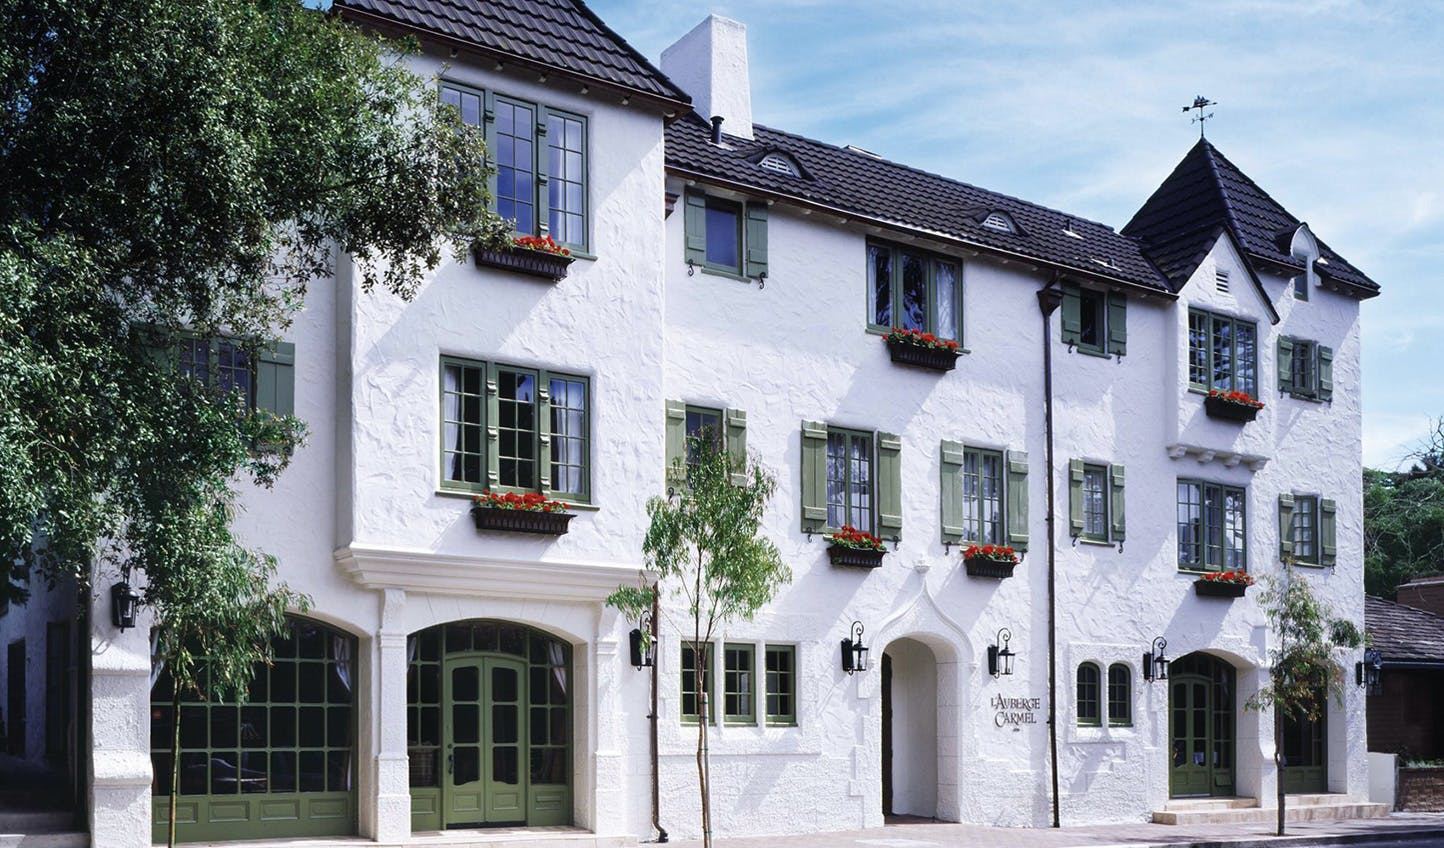 L'Auberge Carmel CA | Luxury Hotels in the USA